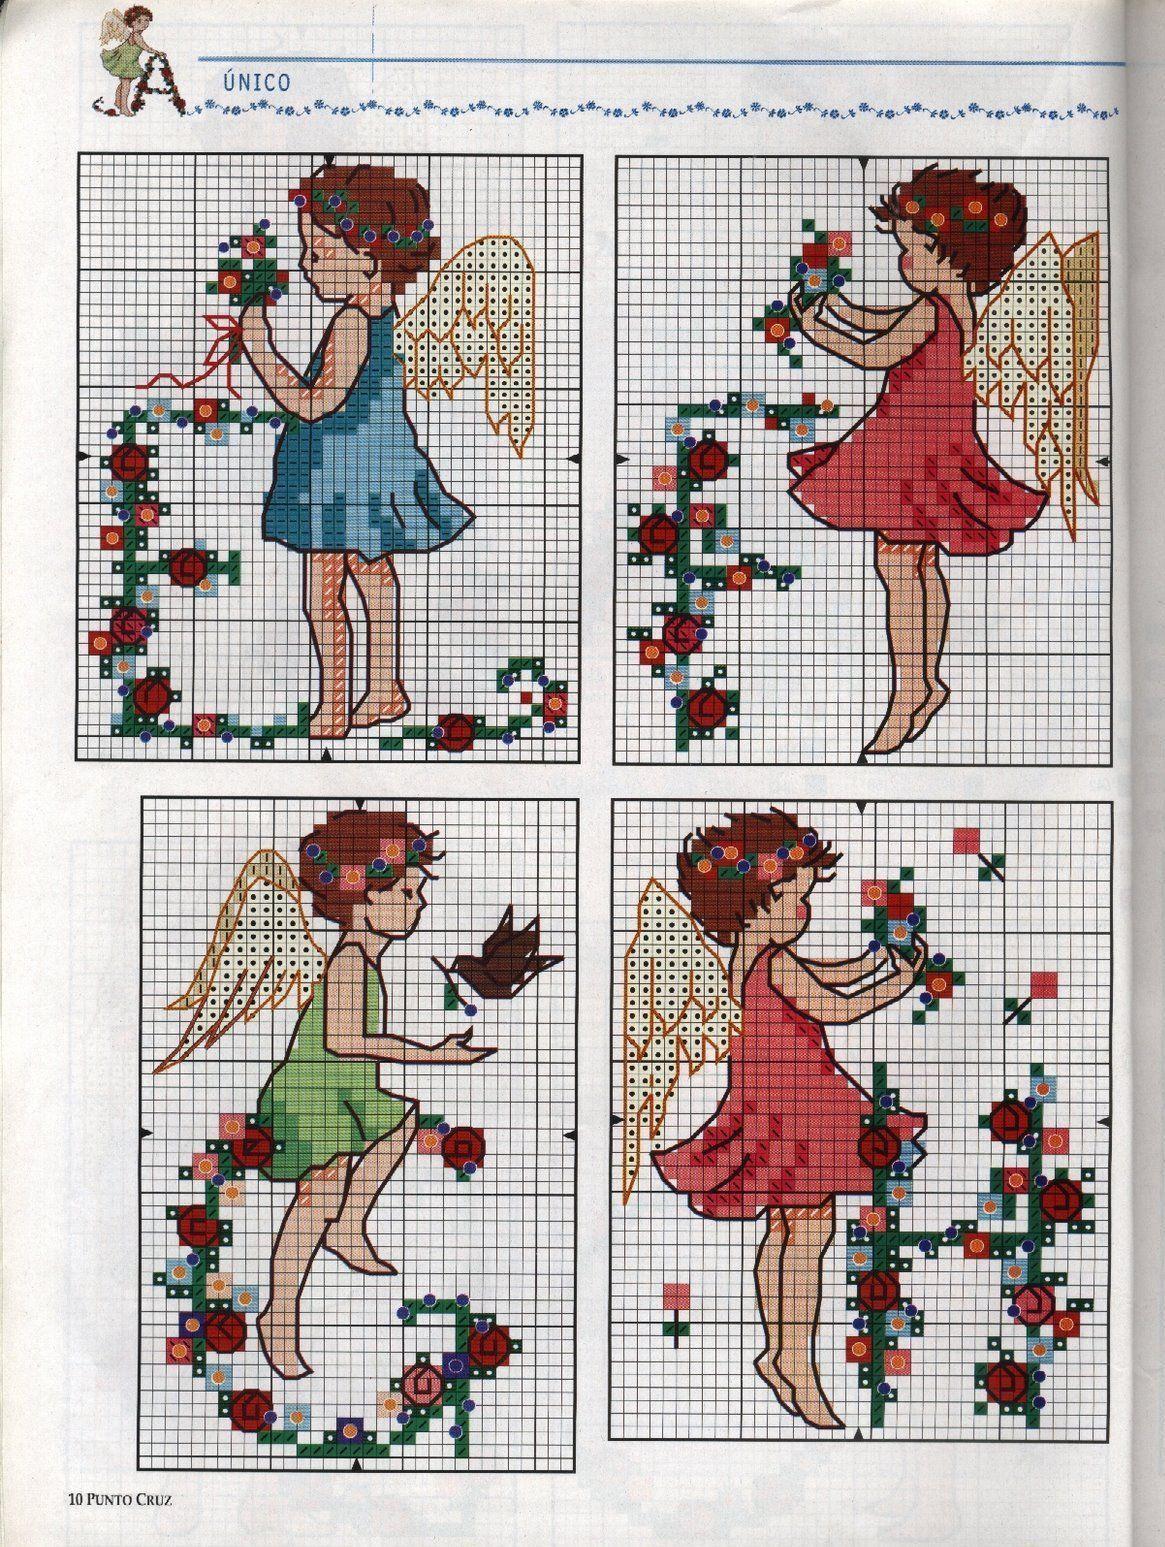 Pin de annemarieallombert en alphabets | Pinterest | Hadas de las ...